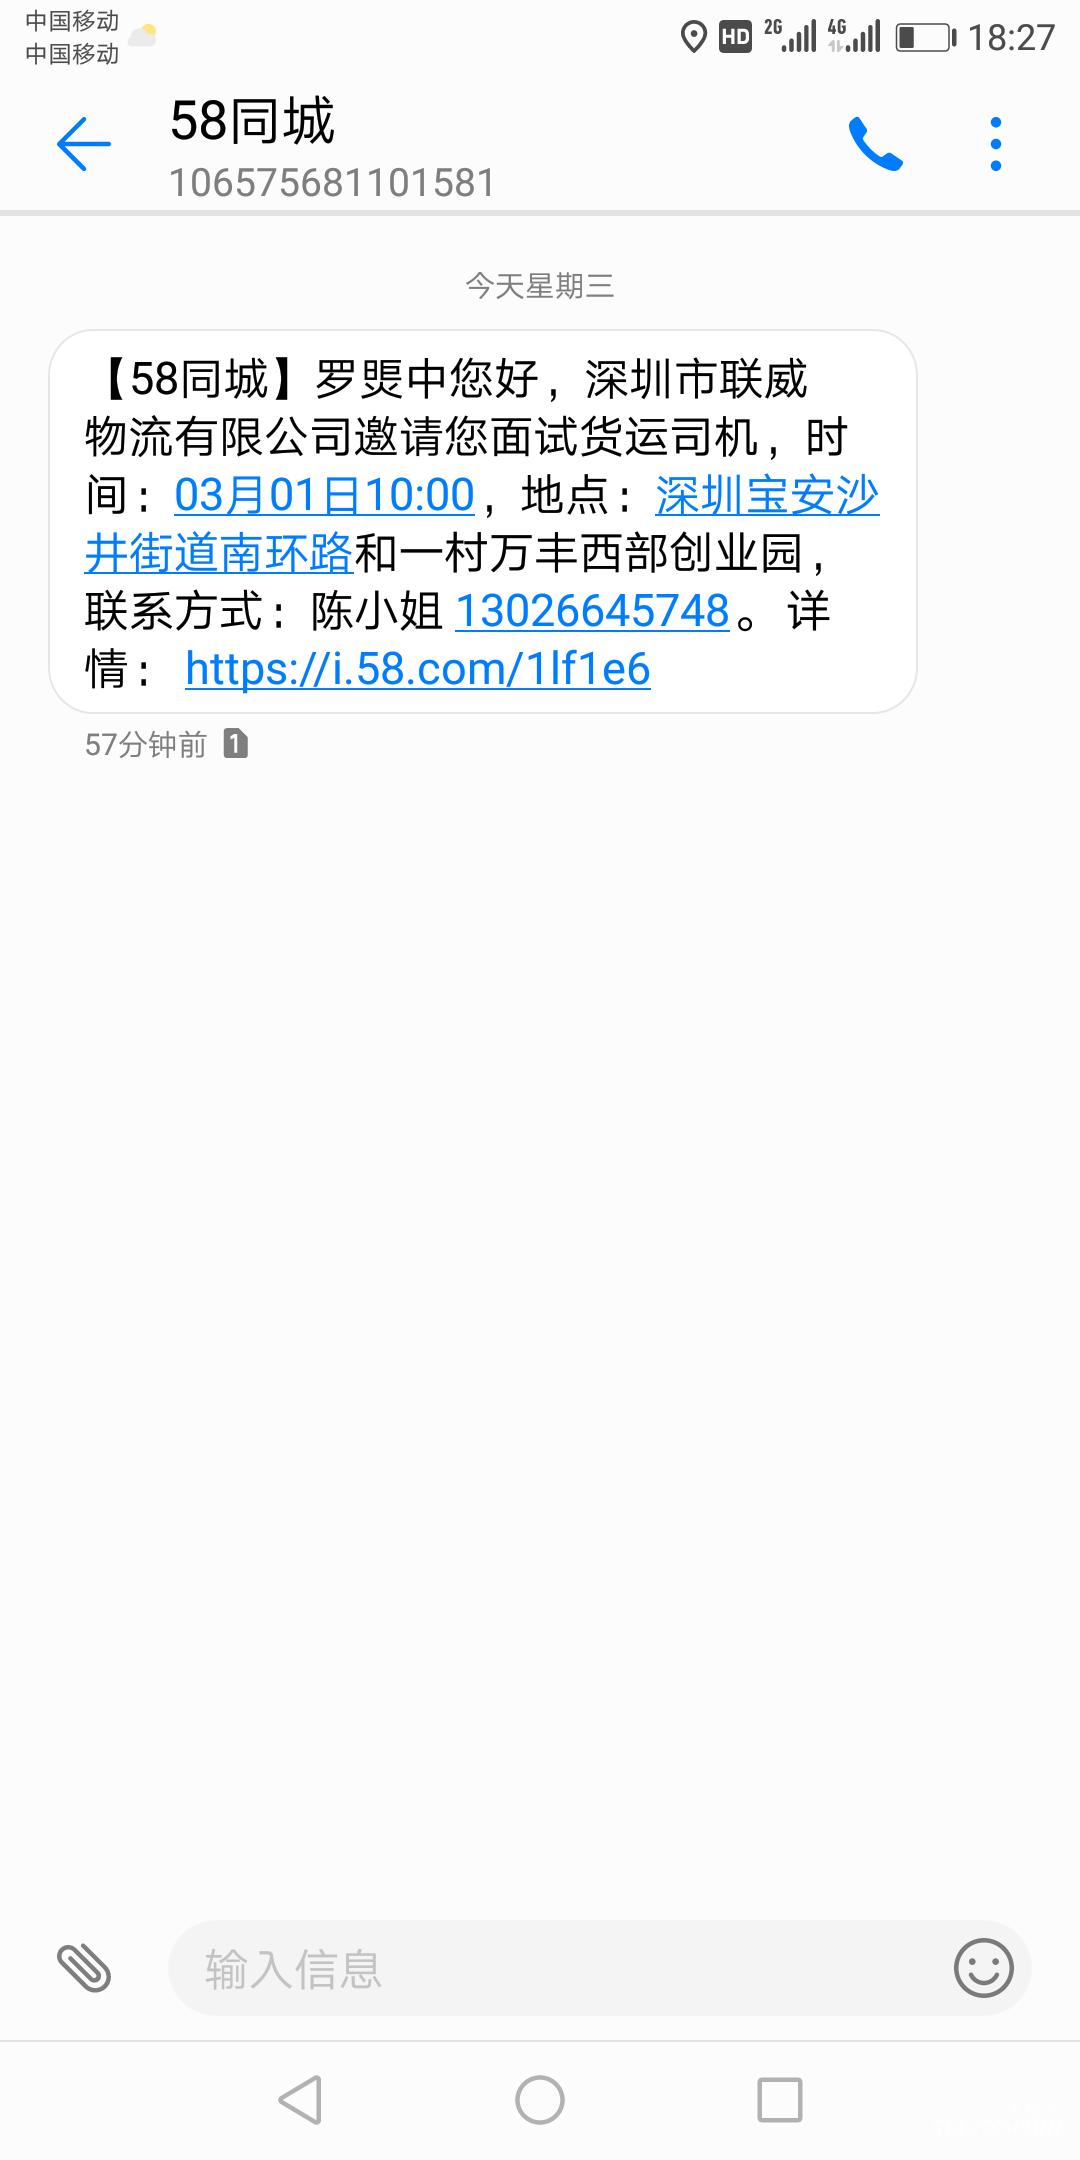 wechat_upload15198144315a96871f35bb5